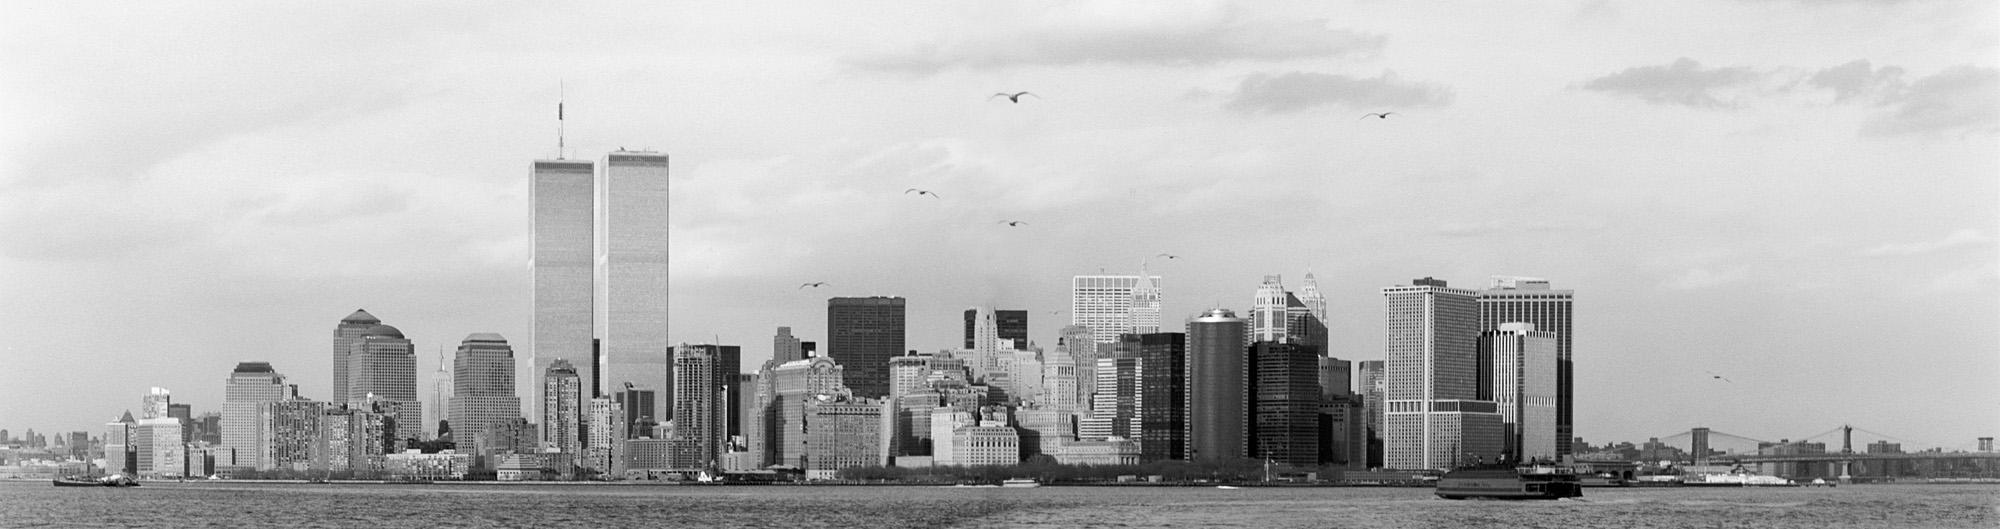 New York- Street Photography